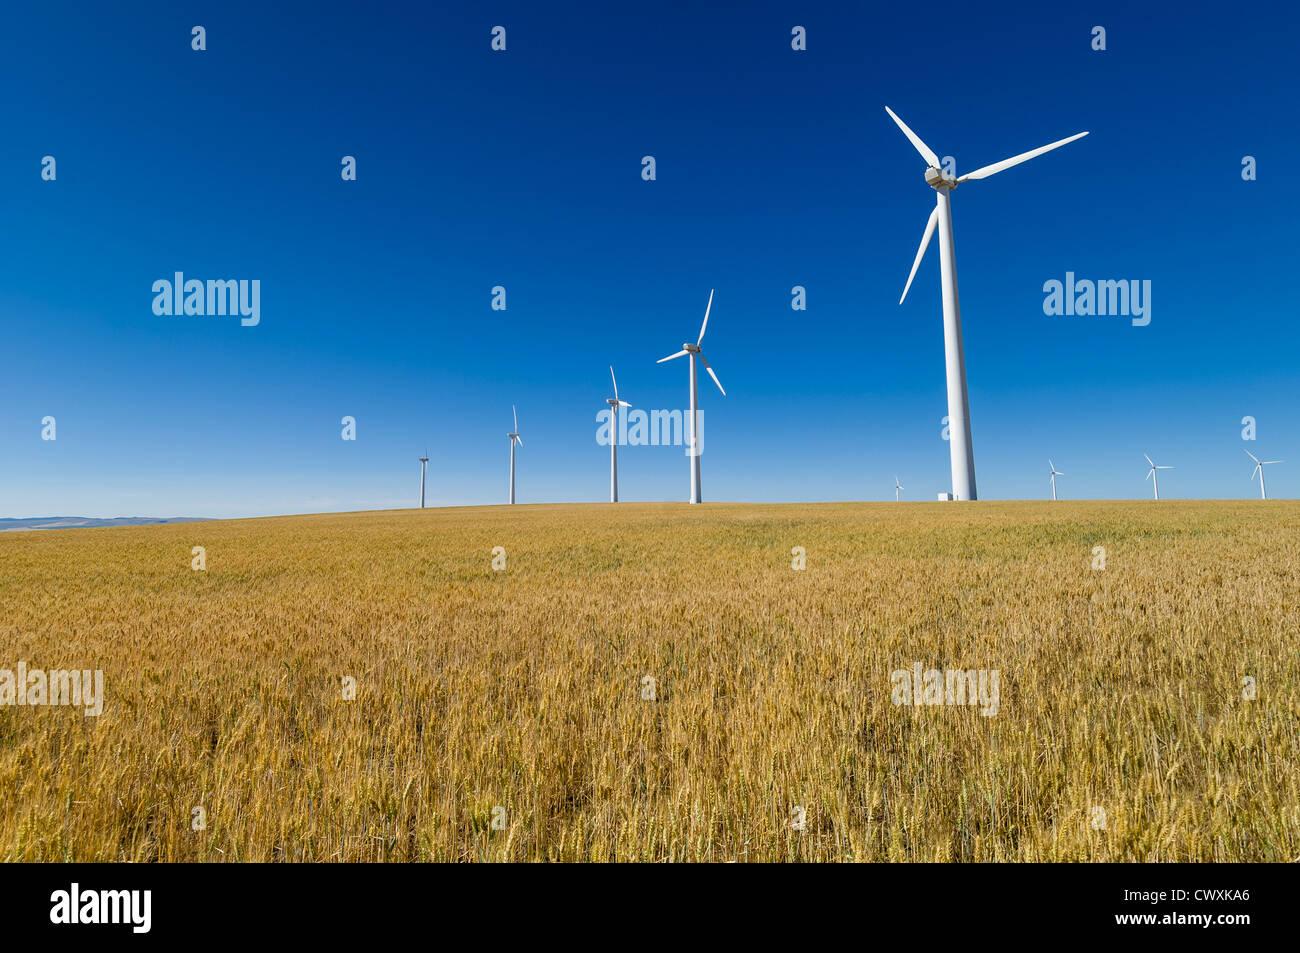 Electricity-generating wind turbines in wheat field near Condon, Oregon. - Stock Image